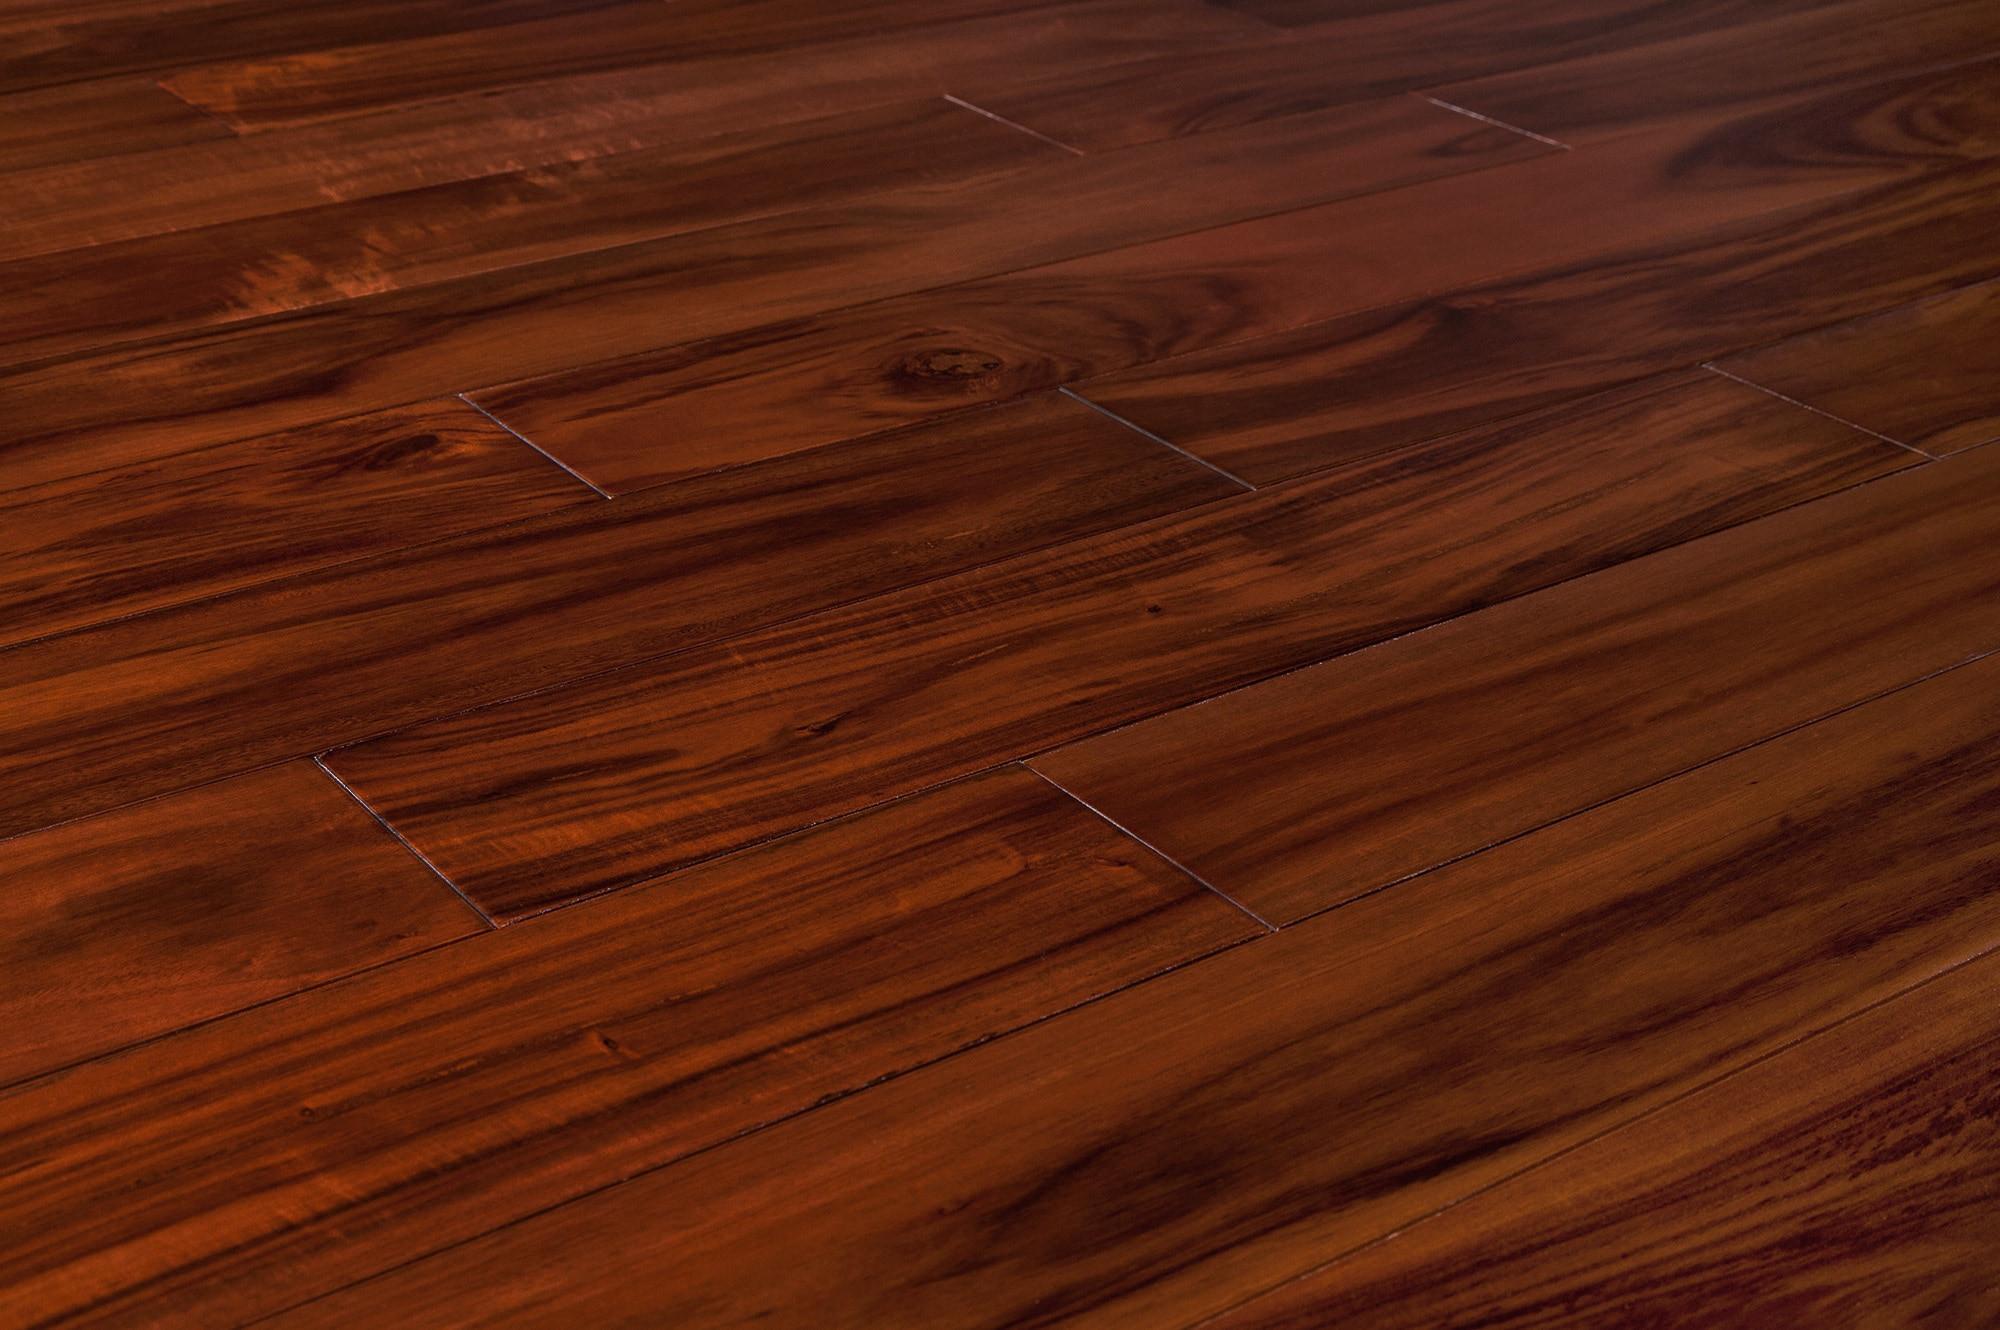 hardwood flooring calgary of acacia hardwood flooring prices best of clearance wood flooring within acacia hardwood flooring prices best of clearance wood flooring house unique wide plank solid hardwood with